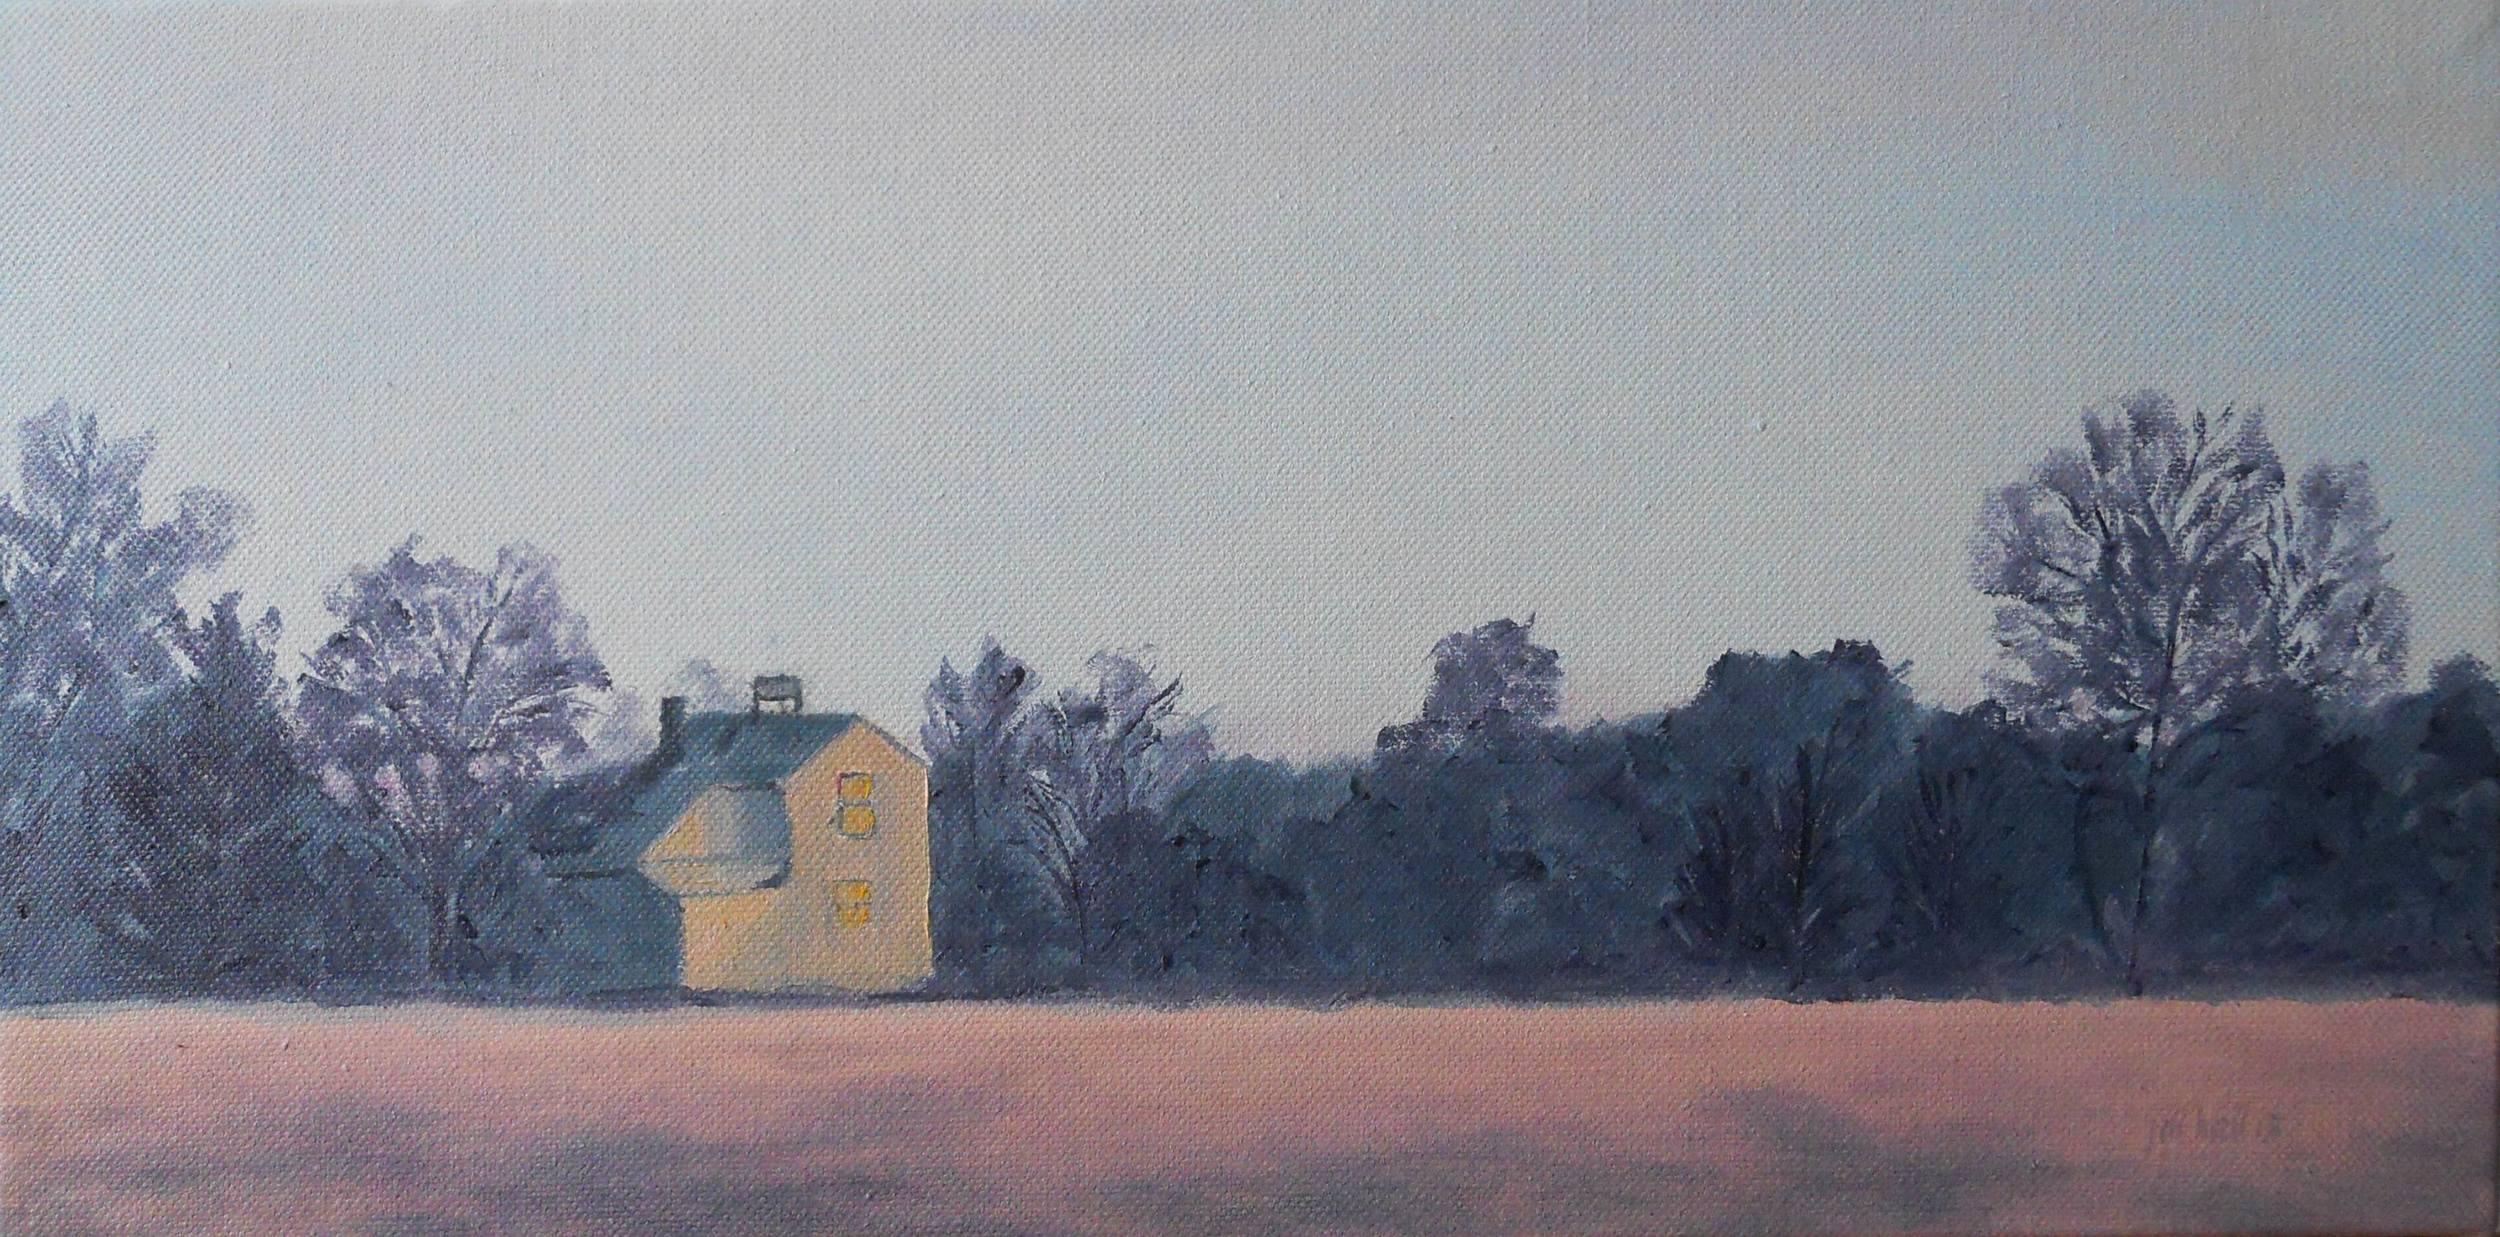 Steeplechase House - 8x16